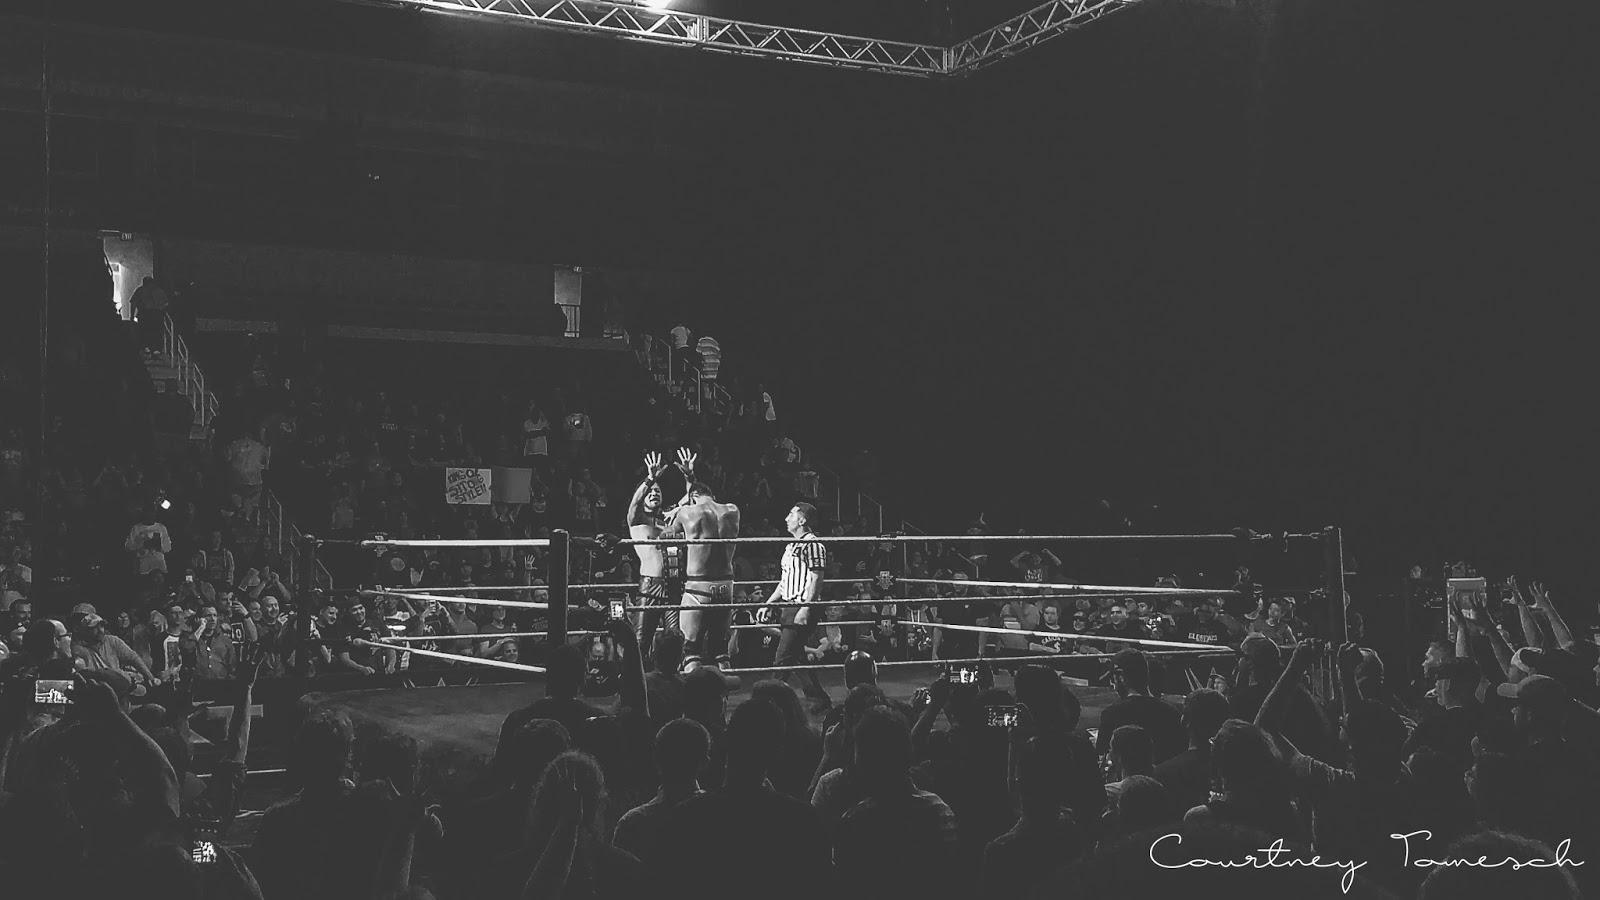 Courtney Tomesch NXT Live Norfolk Shinsuke Nakamura Tye Dillinger